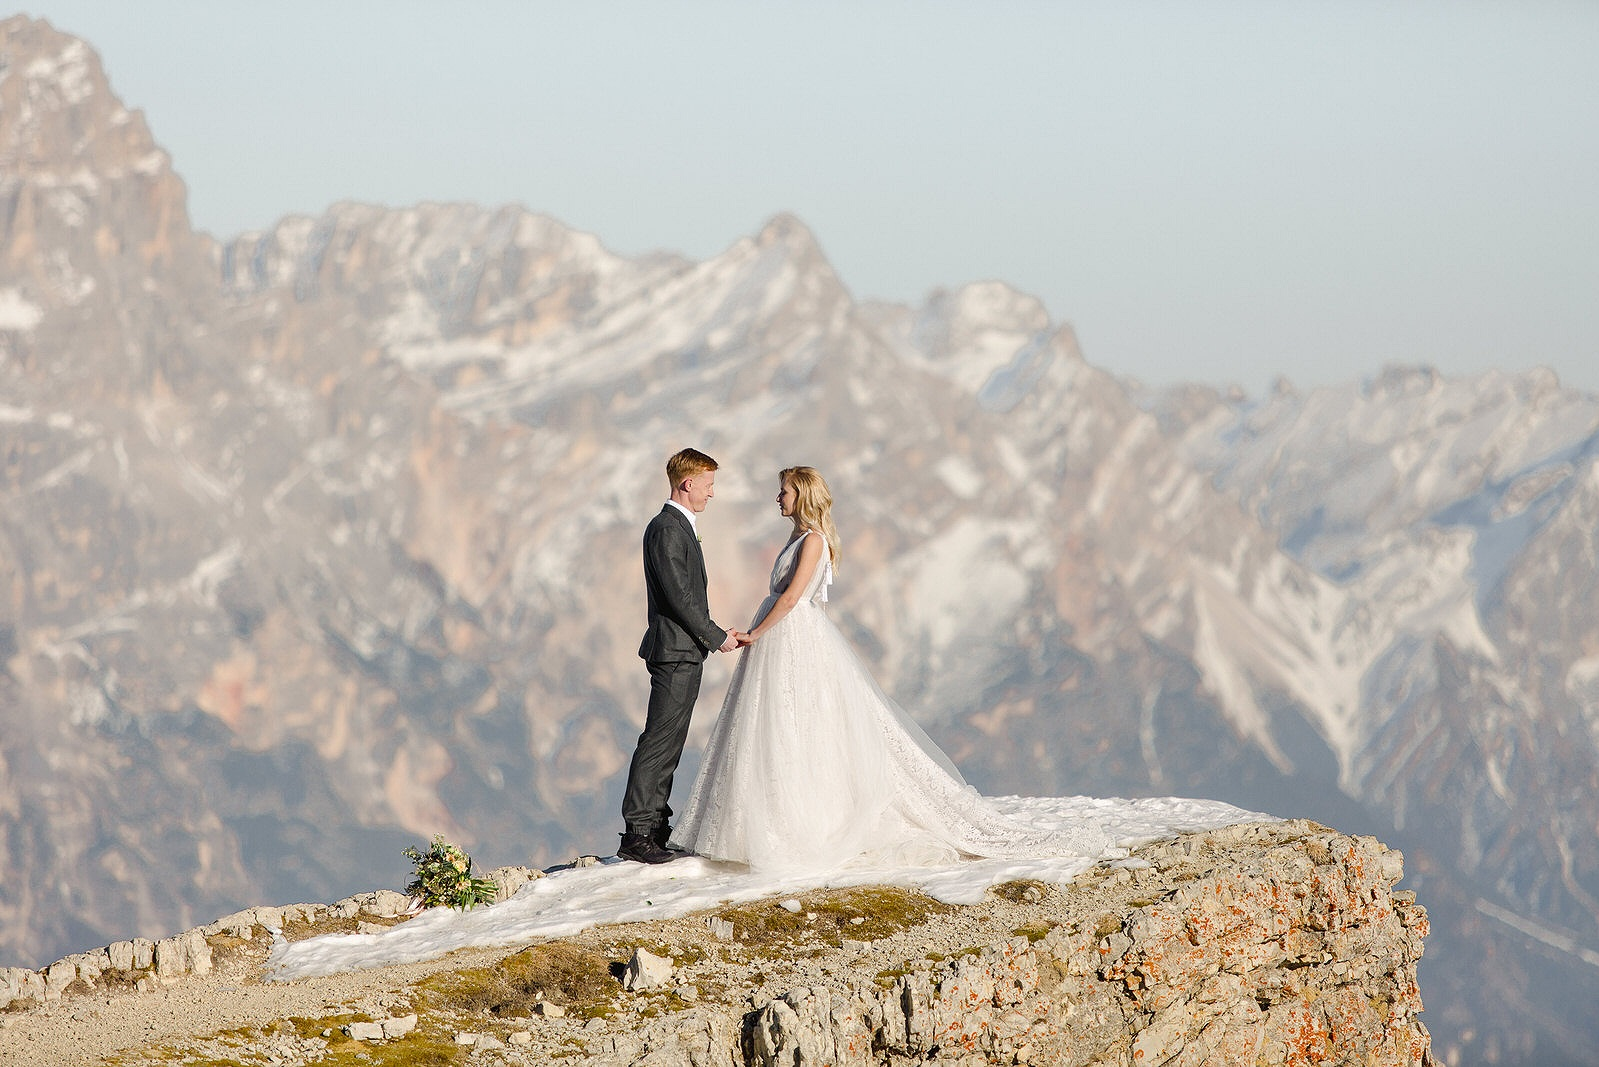 Adventurous+Dolomites+Elopement+Wedding+Fotomagoria18.jpg